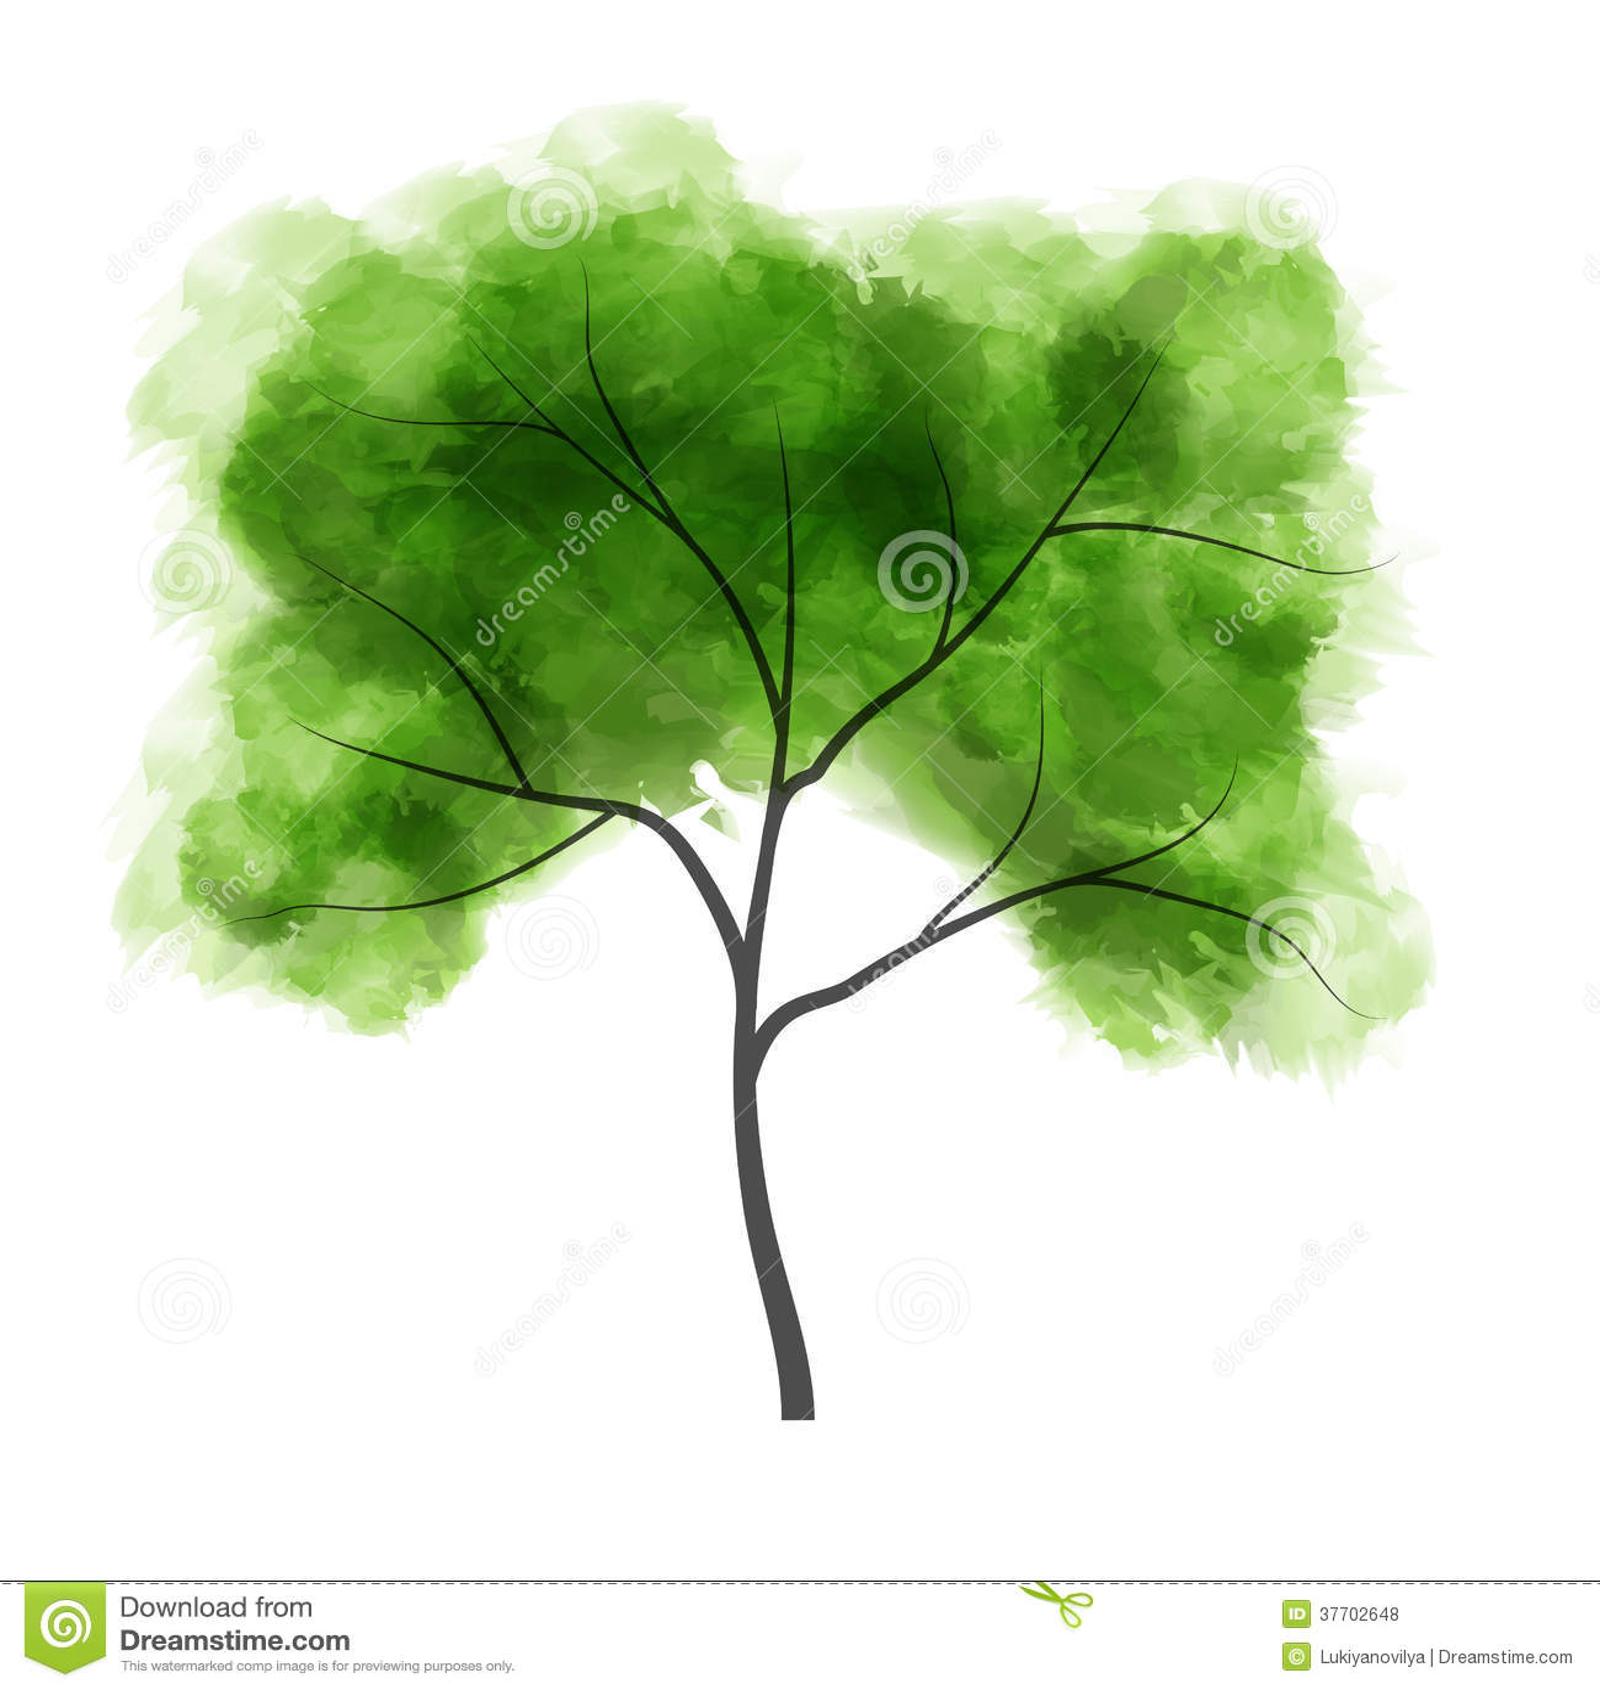 Vector Illustration Tree: Watercolor Tree. Vector Illustration Royalty Free Stock